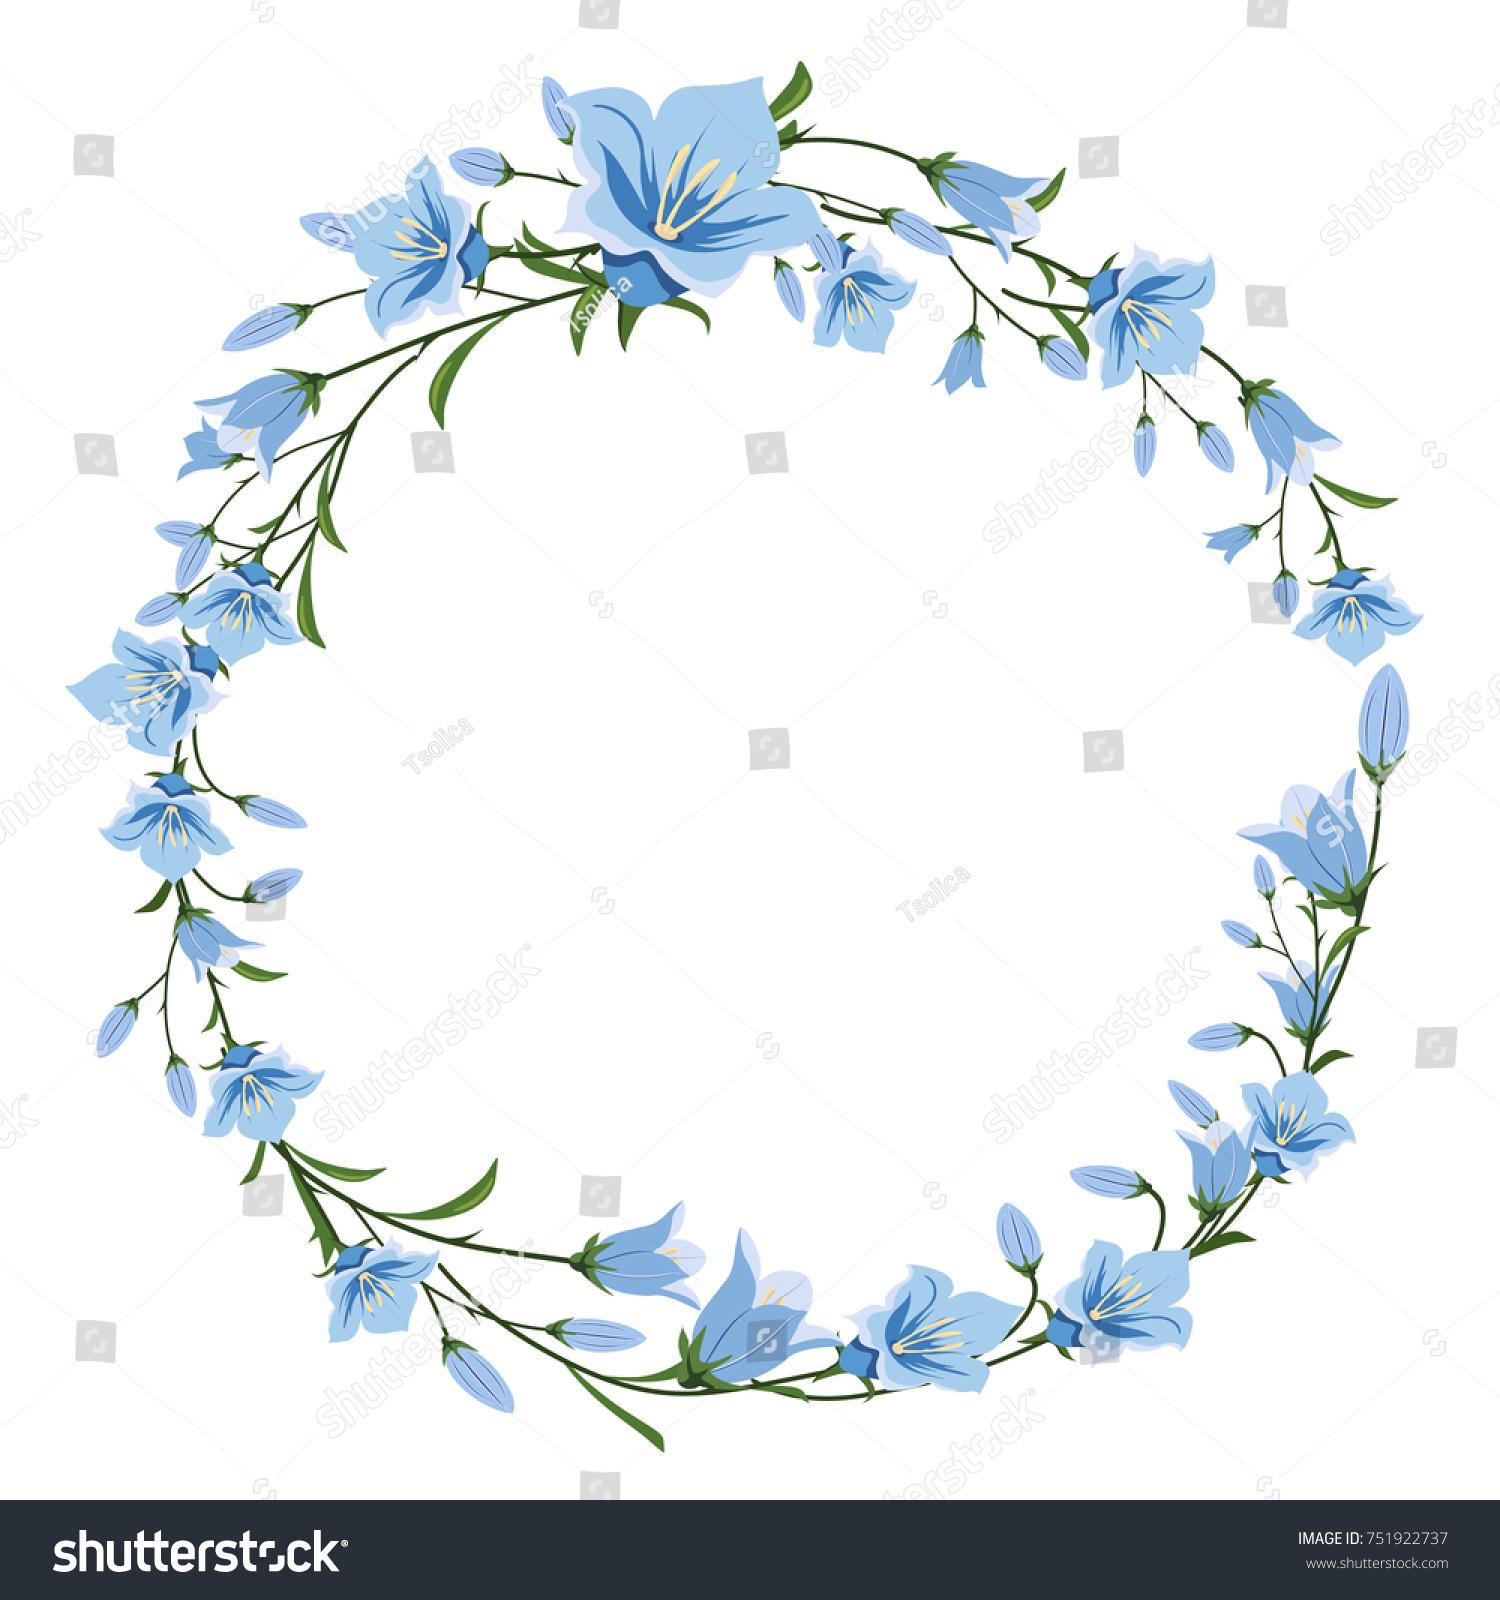 Vector floral wreath blue flowers flower stock vector royalty free vector floral wreath of blue flowers flower frame for greetings invitations design of izmirmasajfo